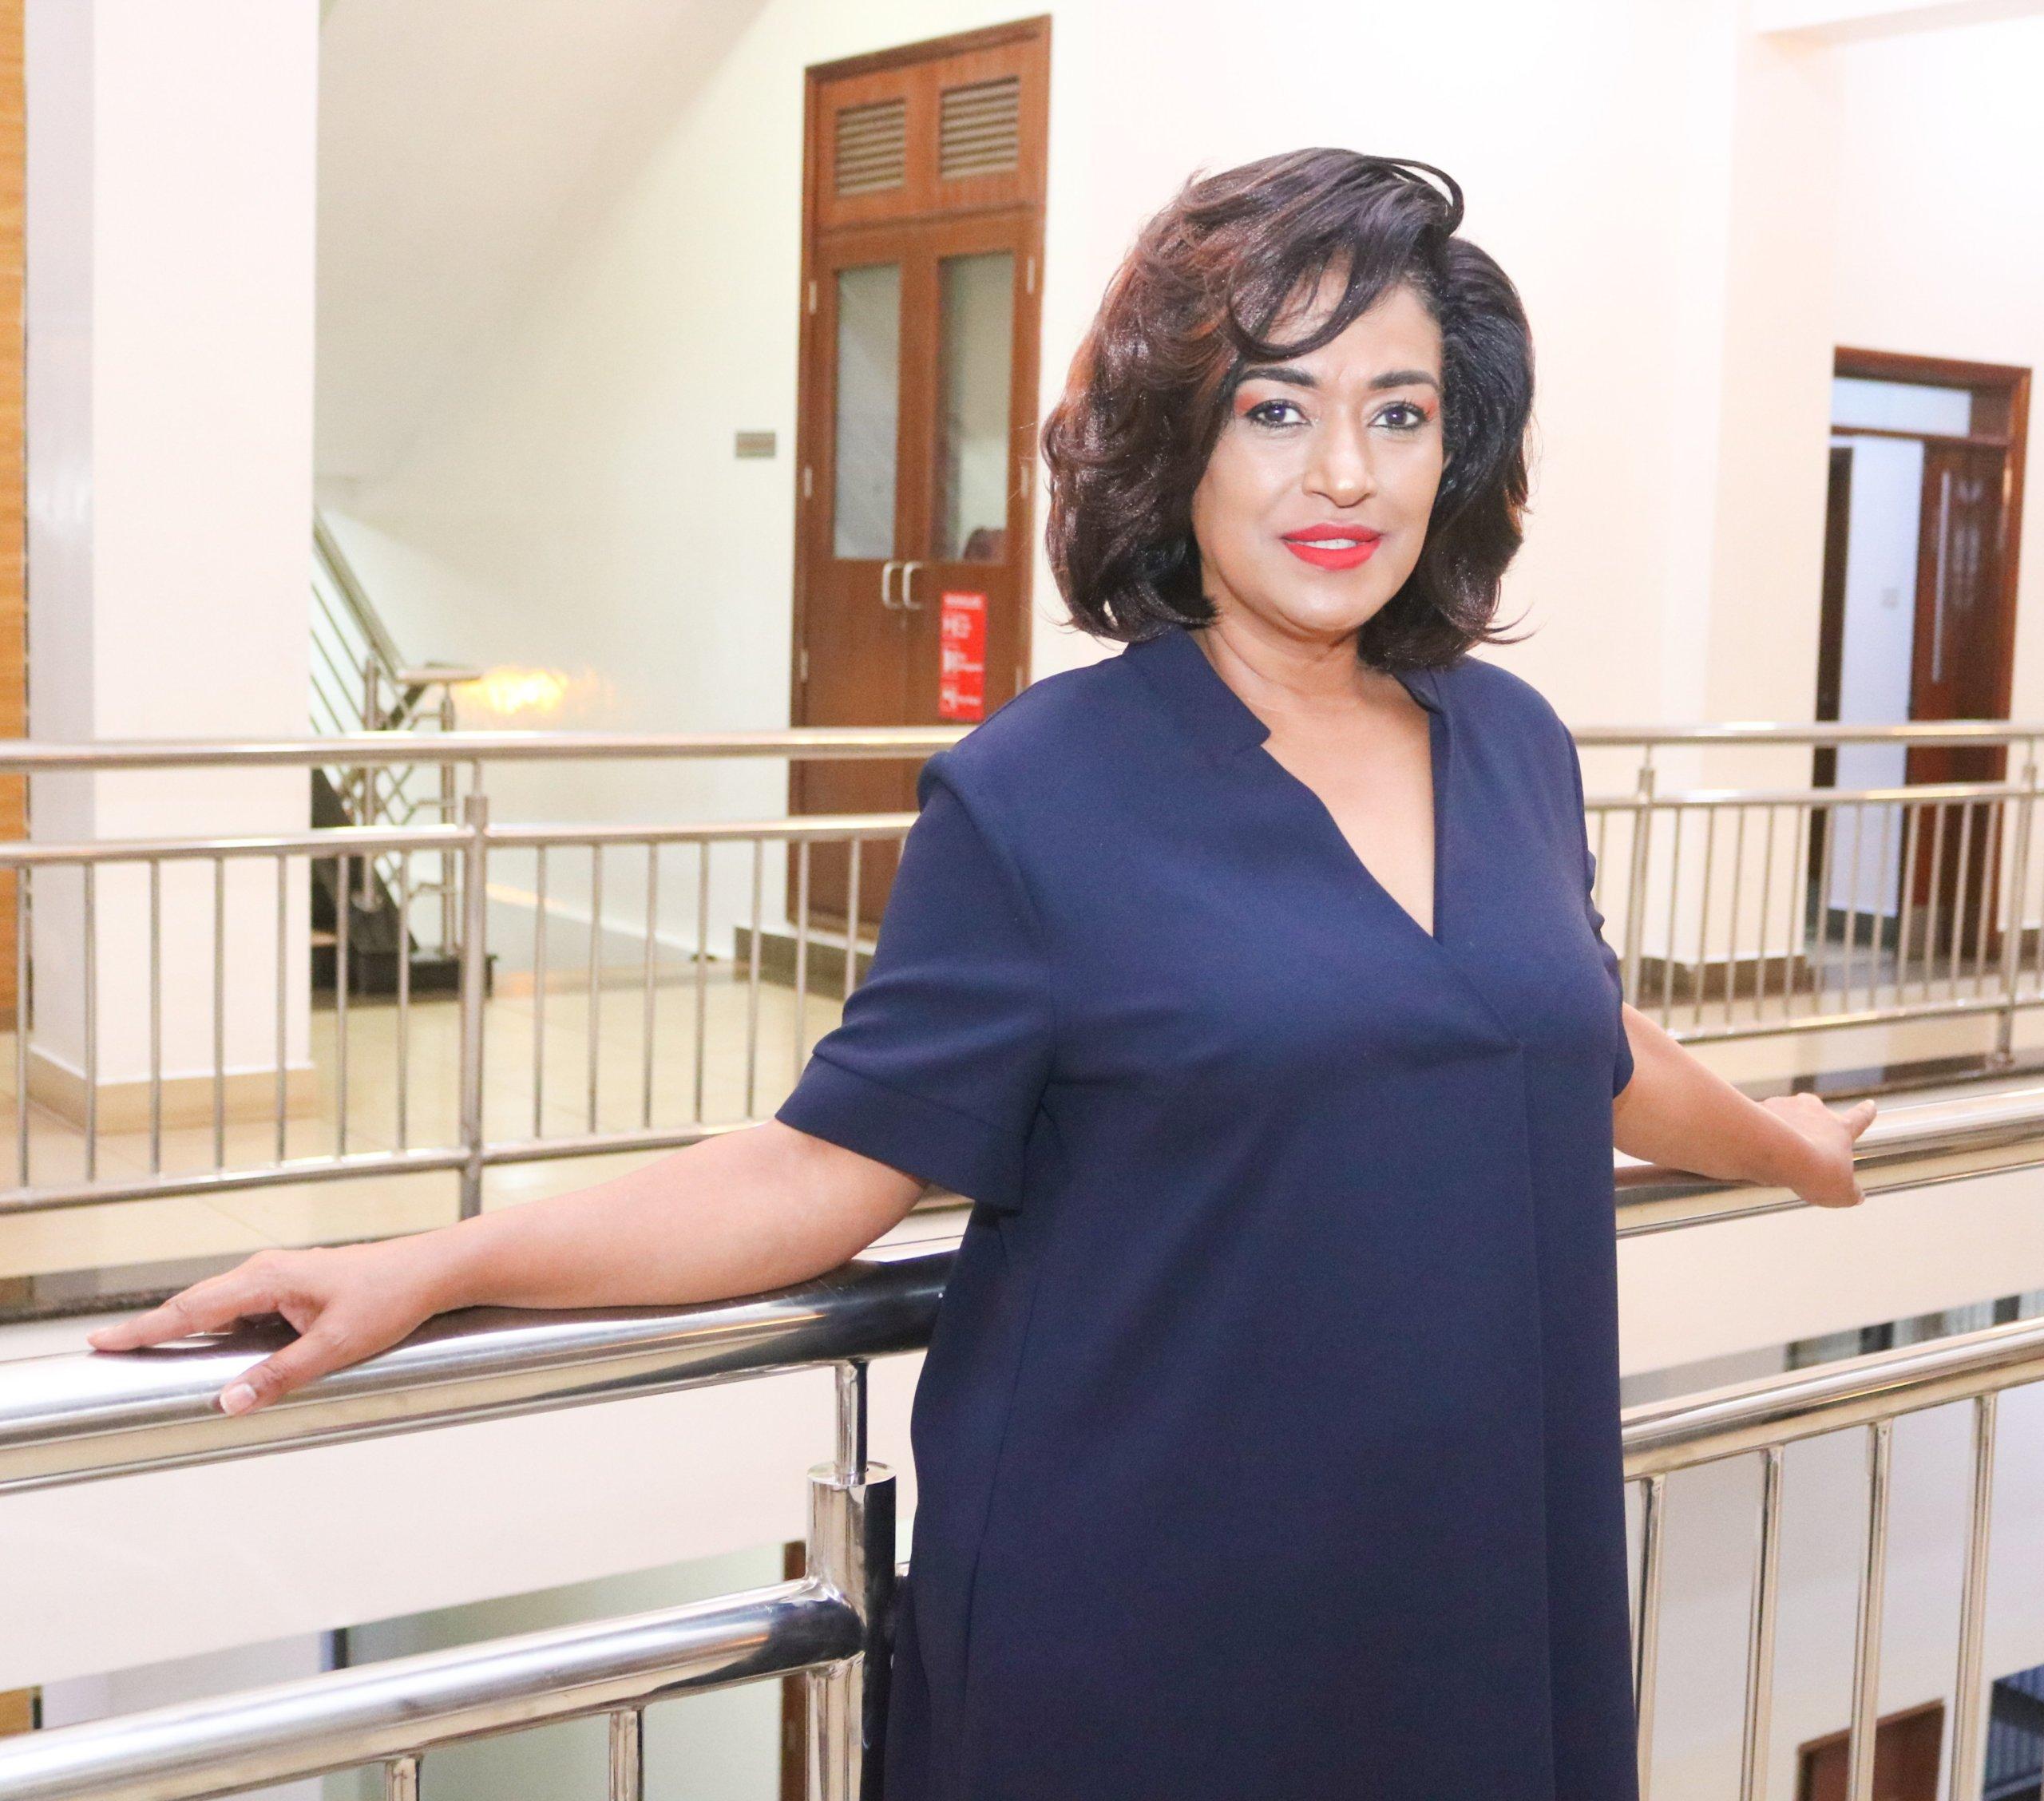 Esther Passaris Turned 56 this week